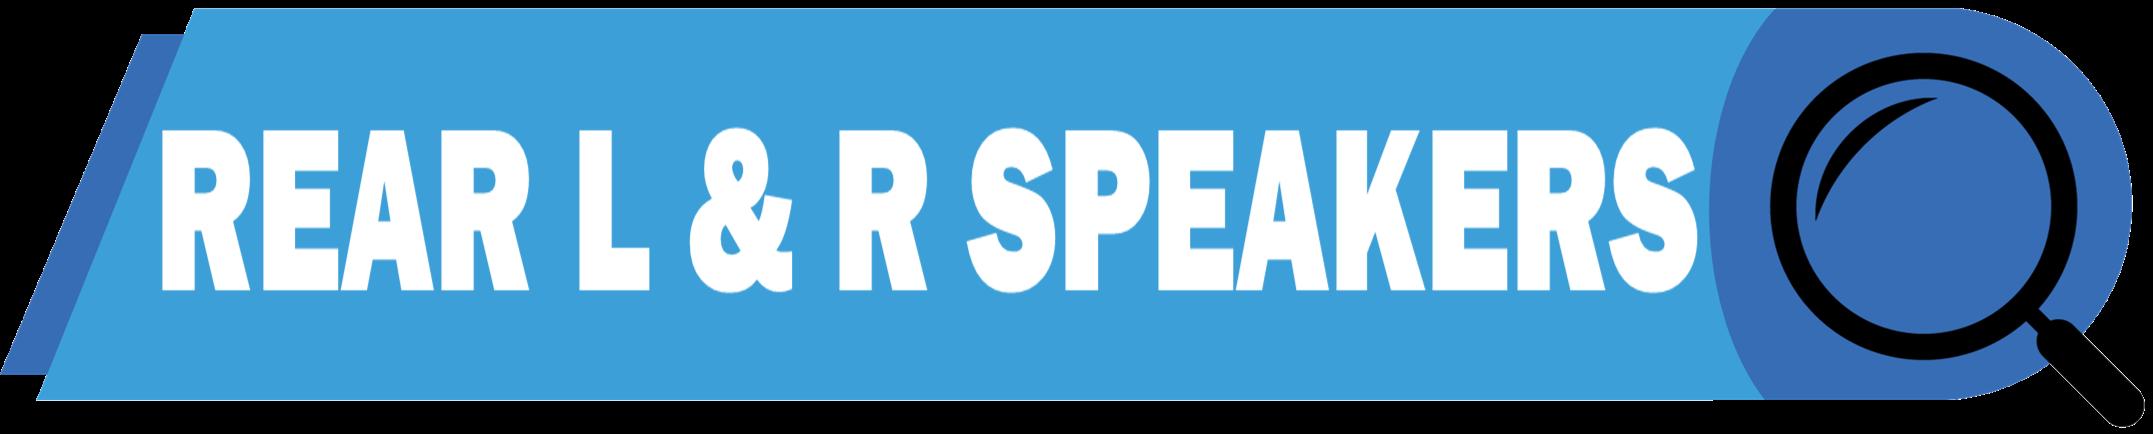 rear-speakers-click-bar-a.png